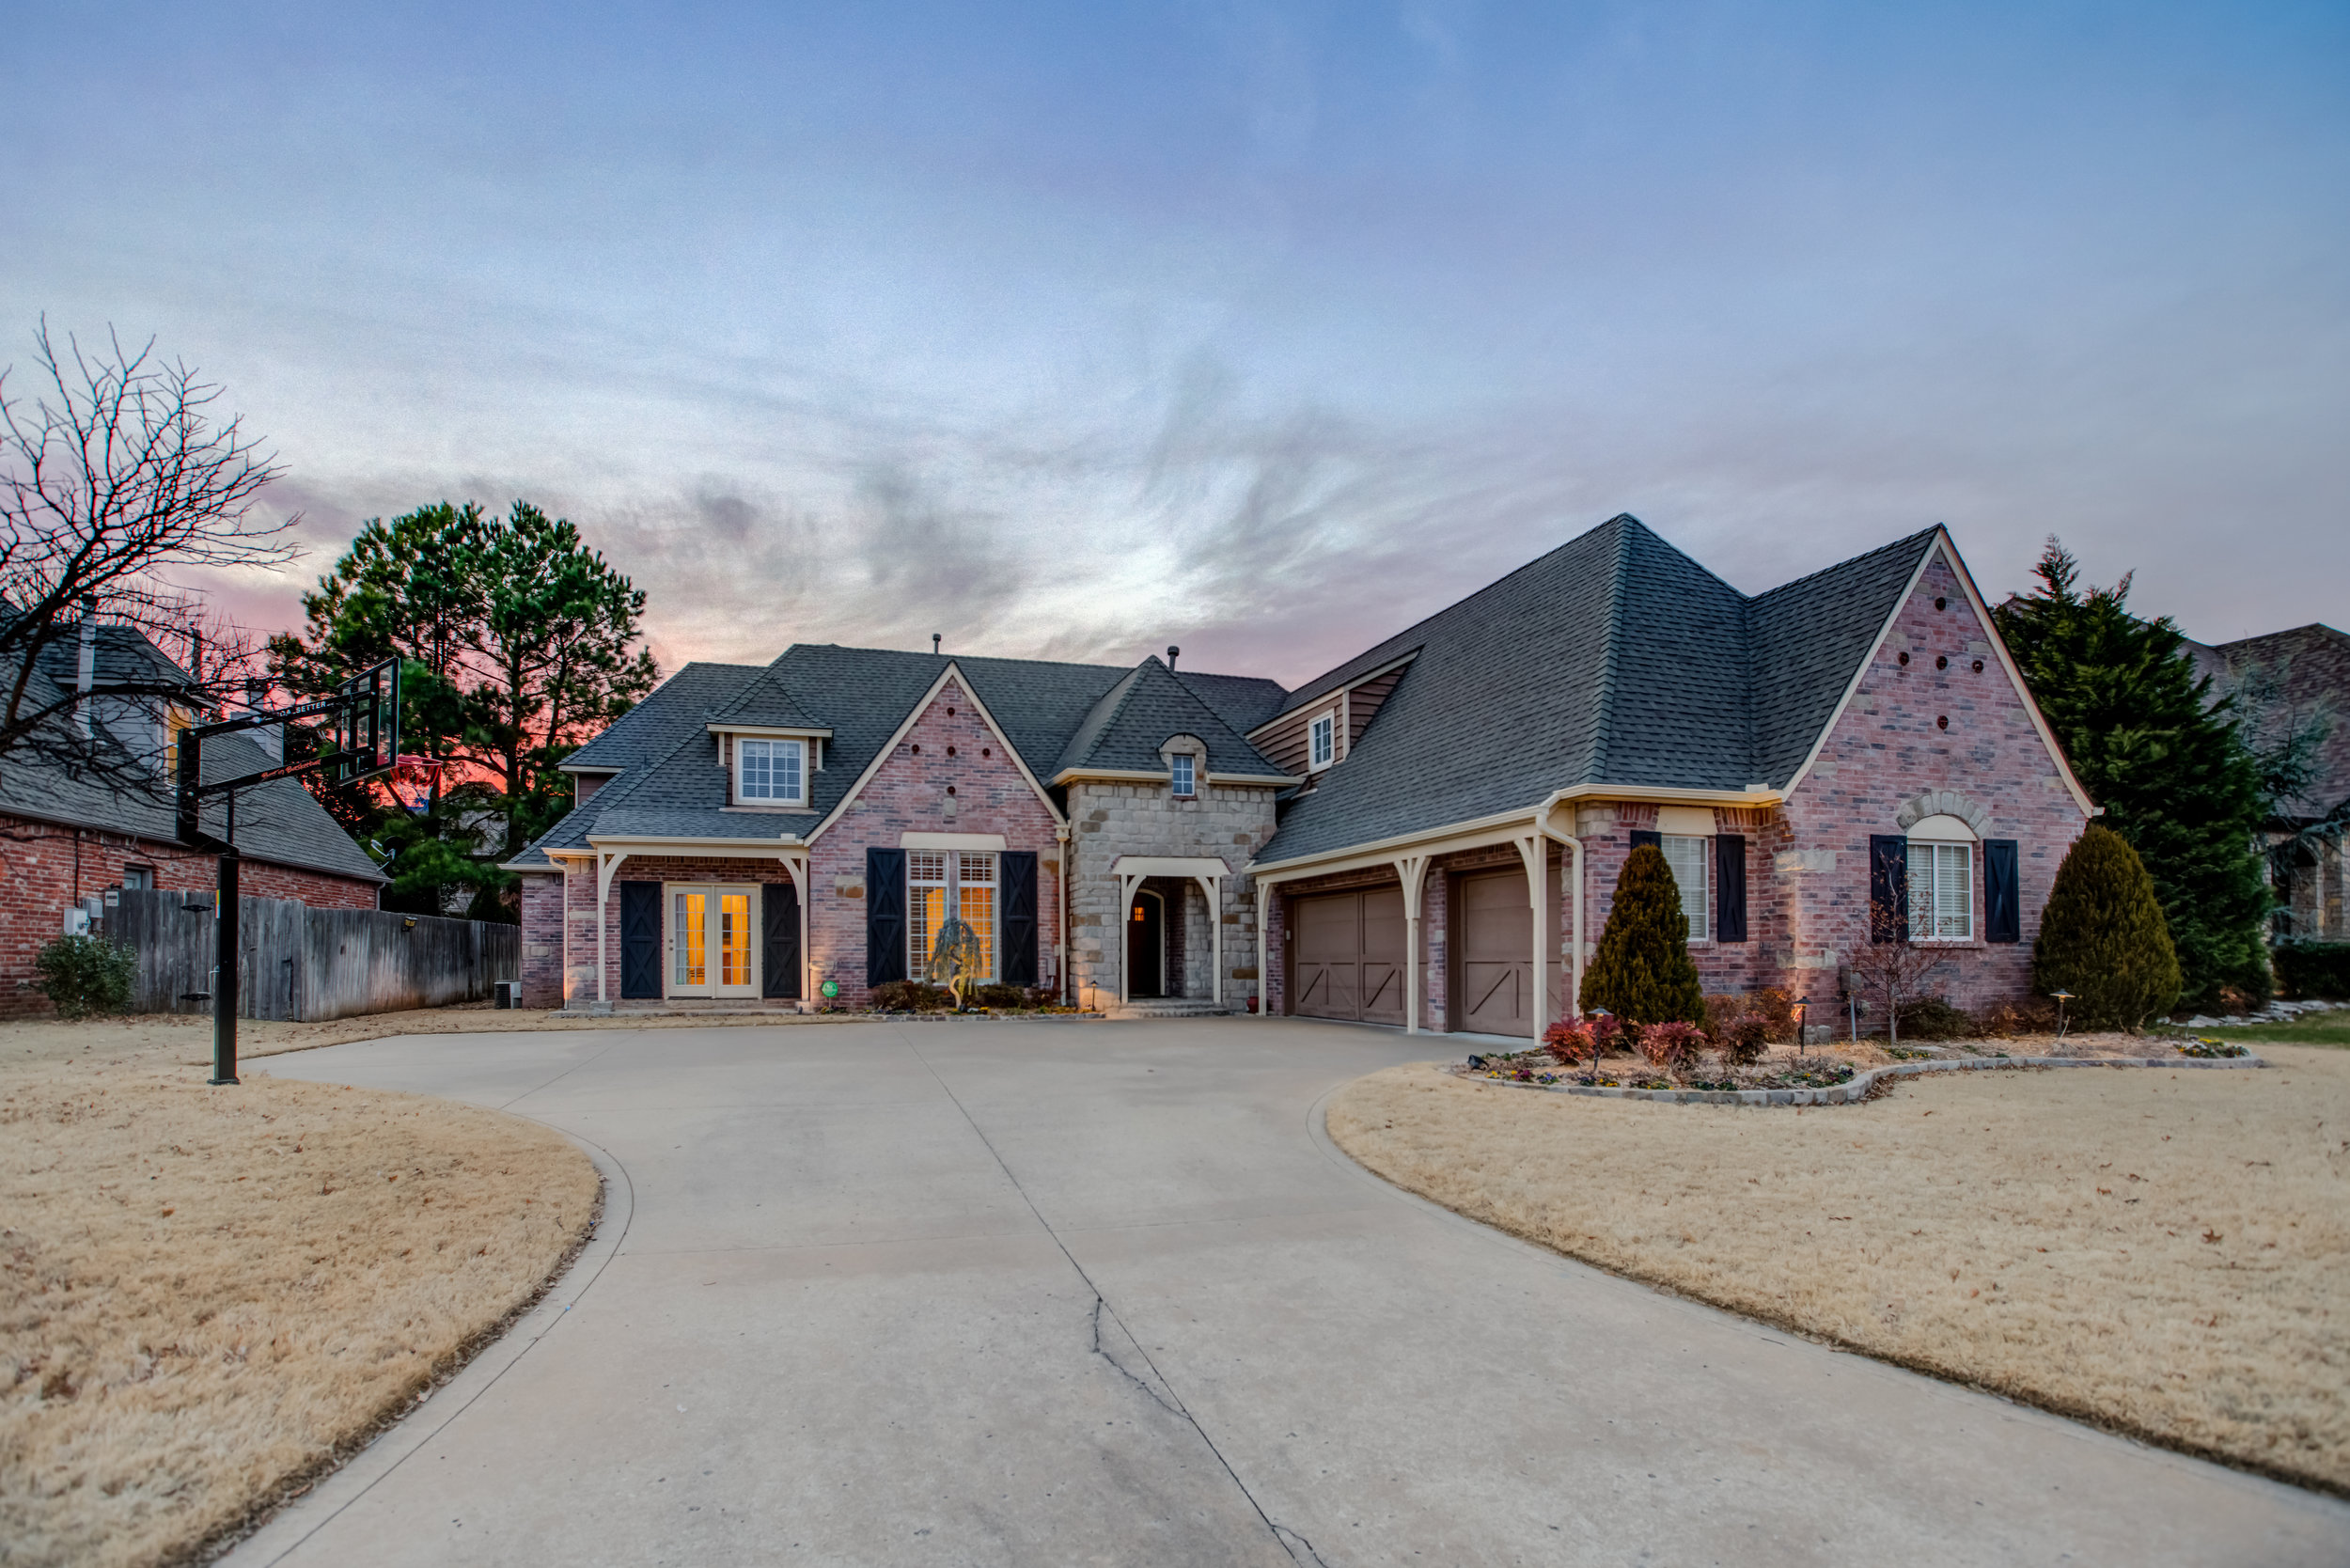 11010 S Hudson Ave - Tulsa, OK - $399,500